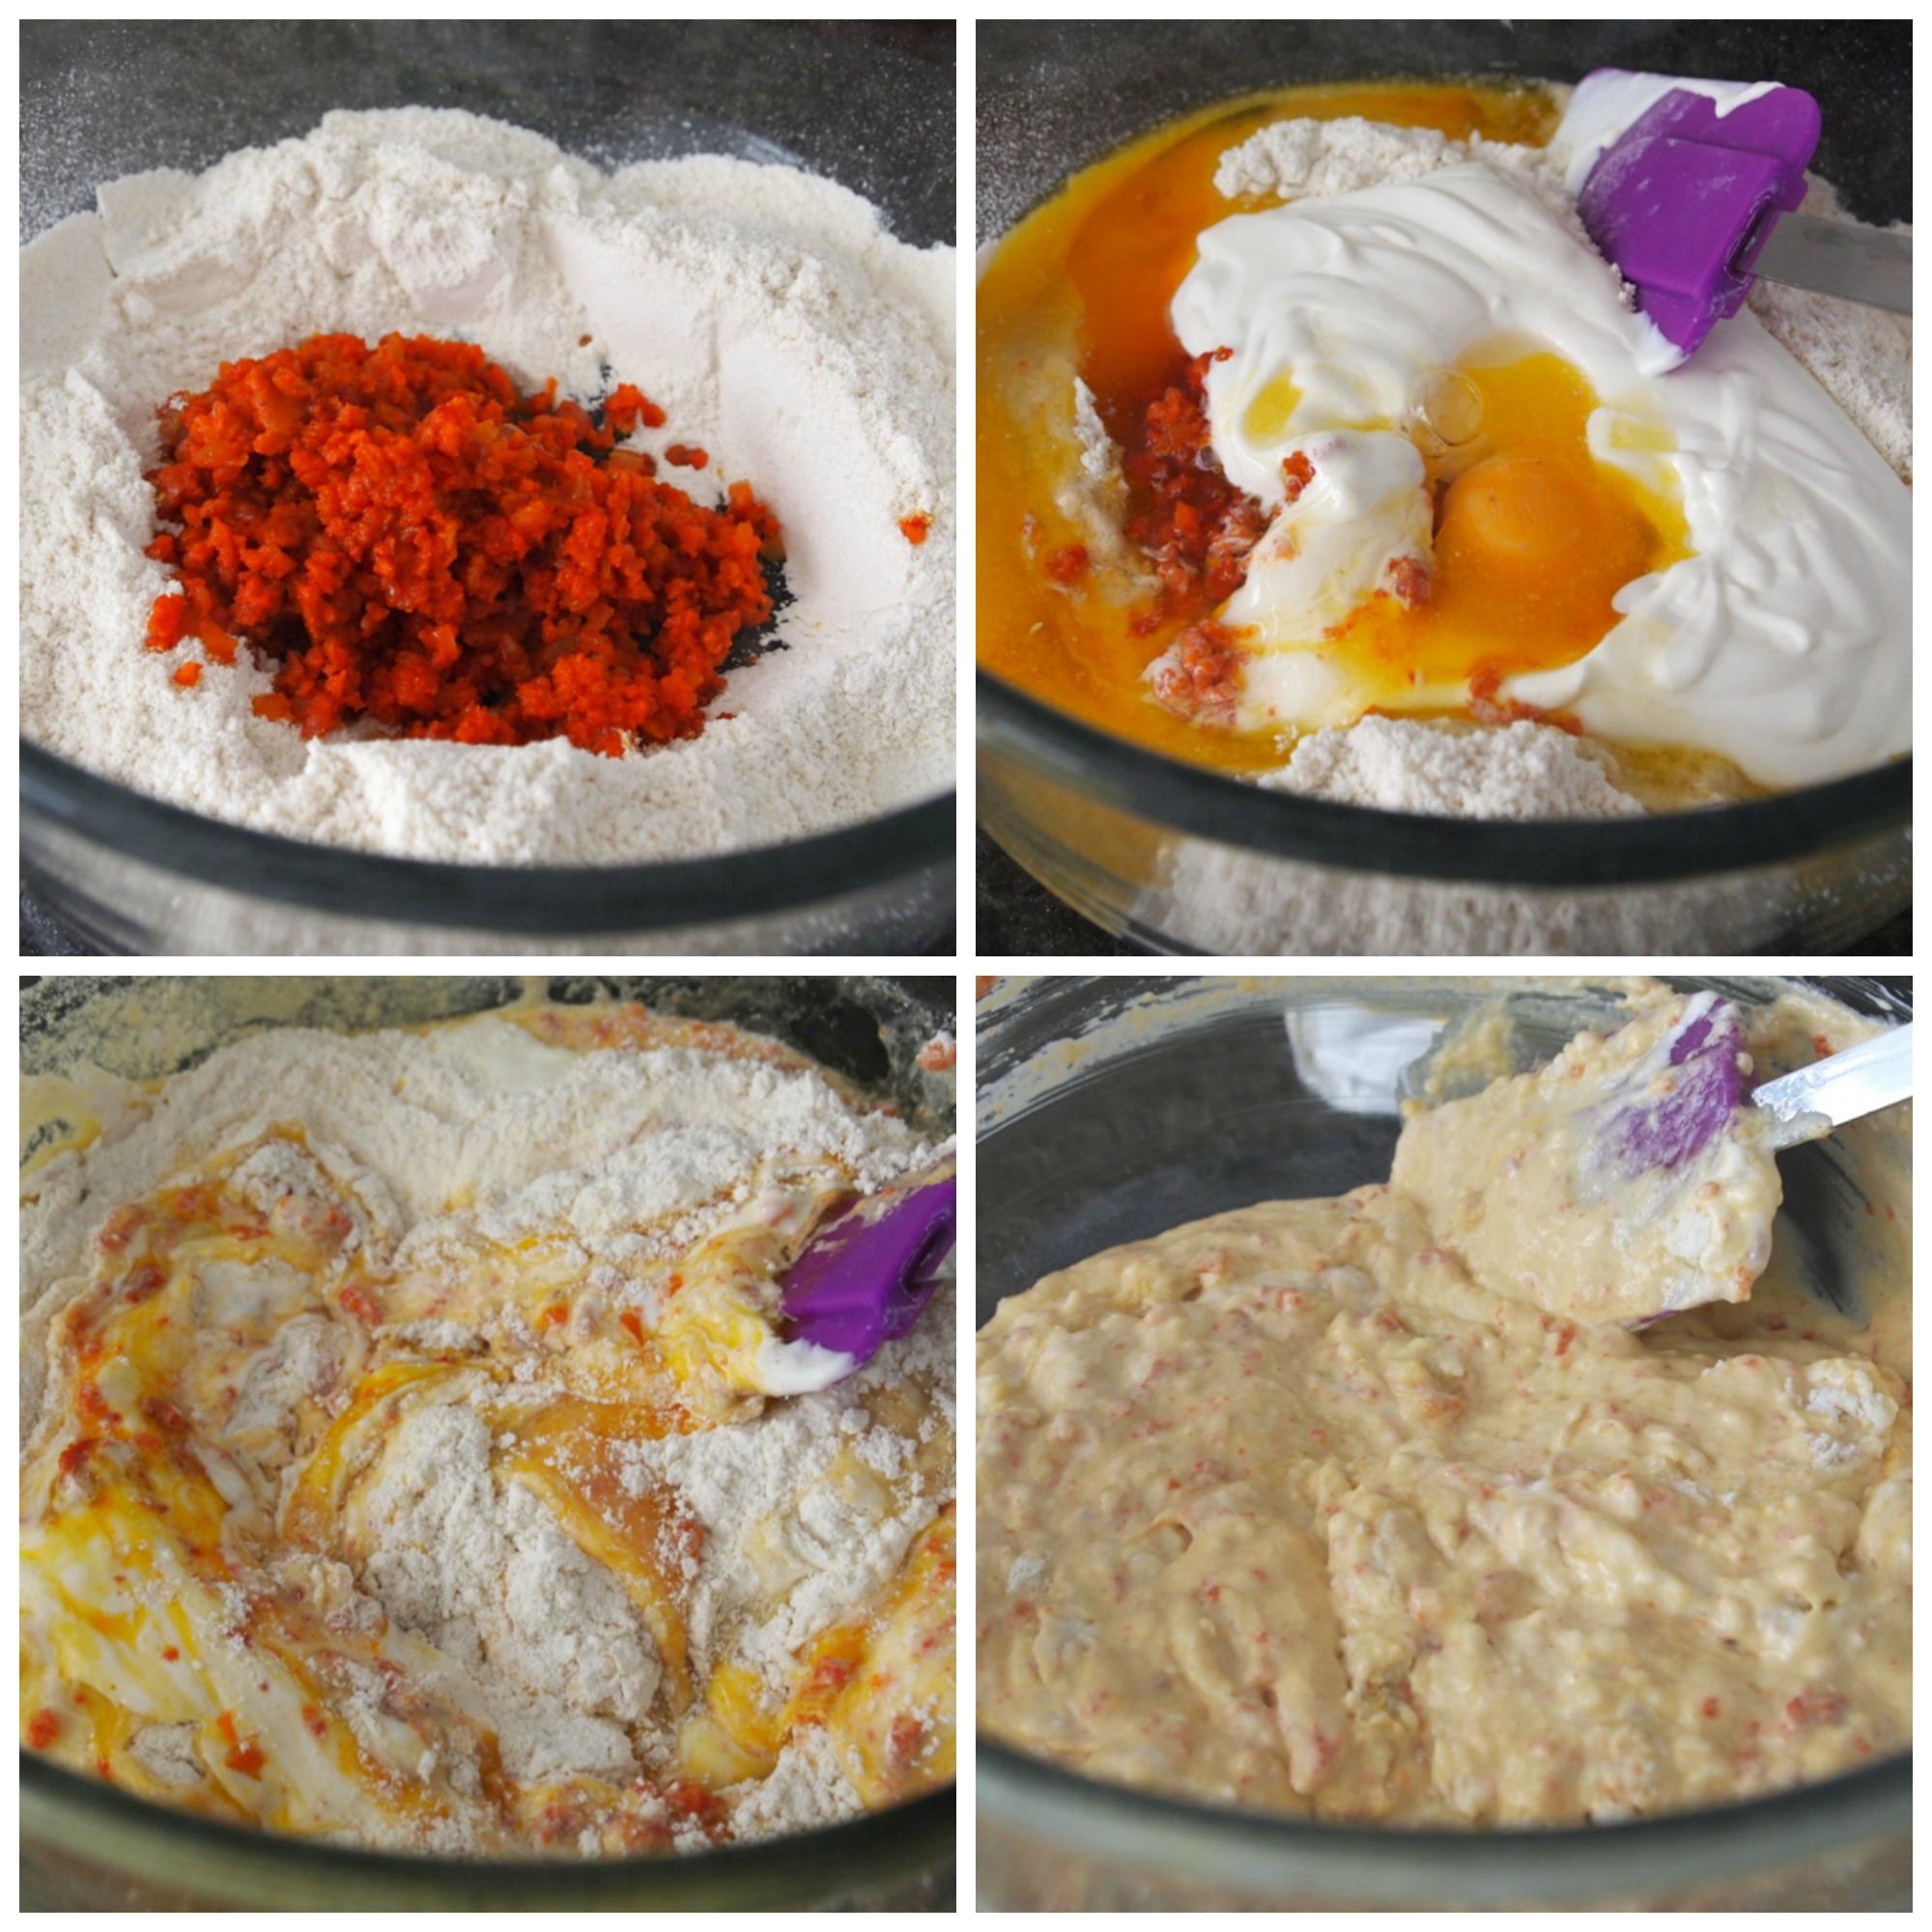 Maseca muffins with salchicha de Huacho. jpg